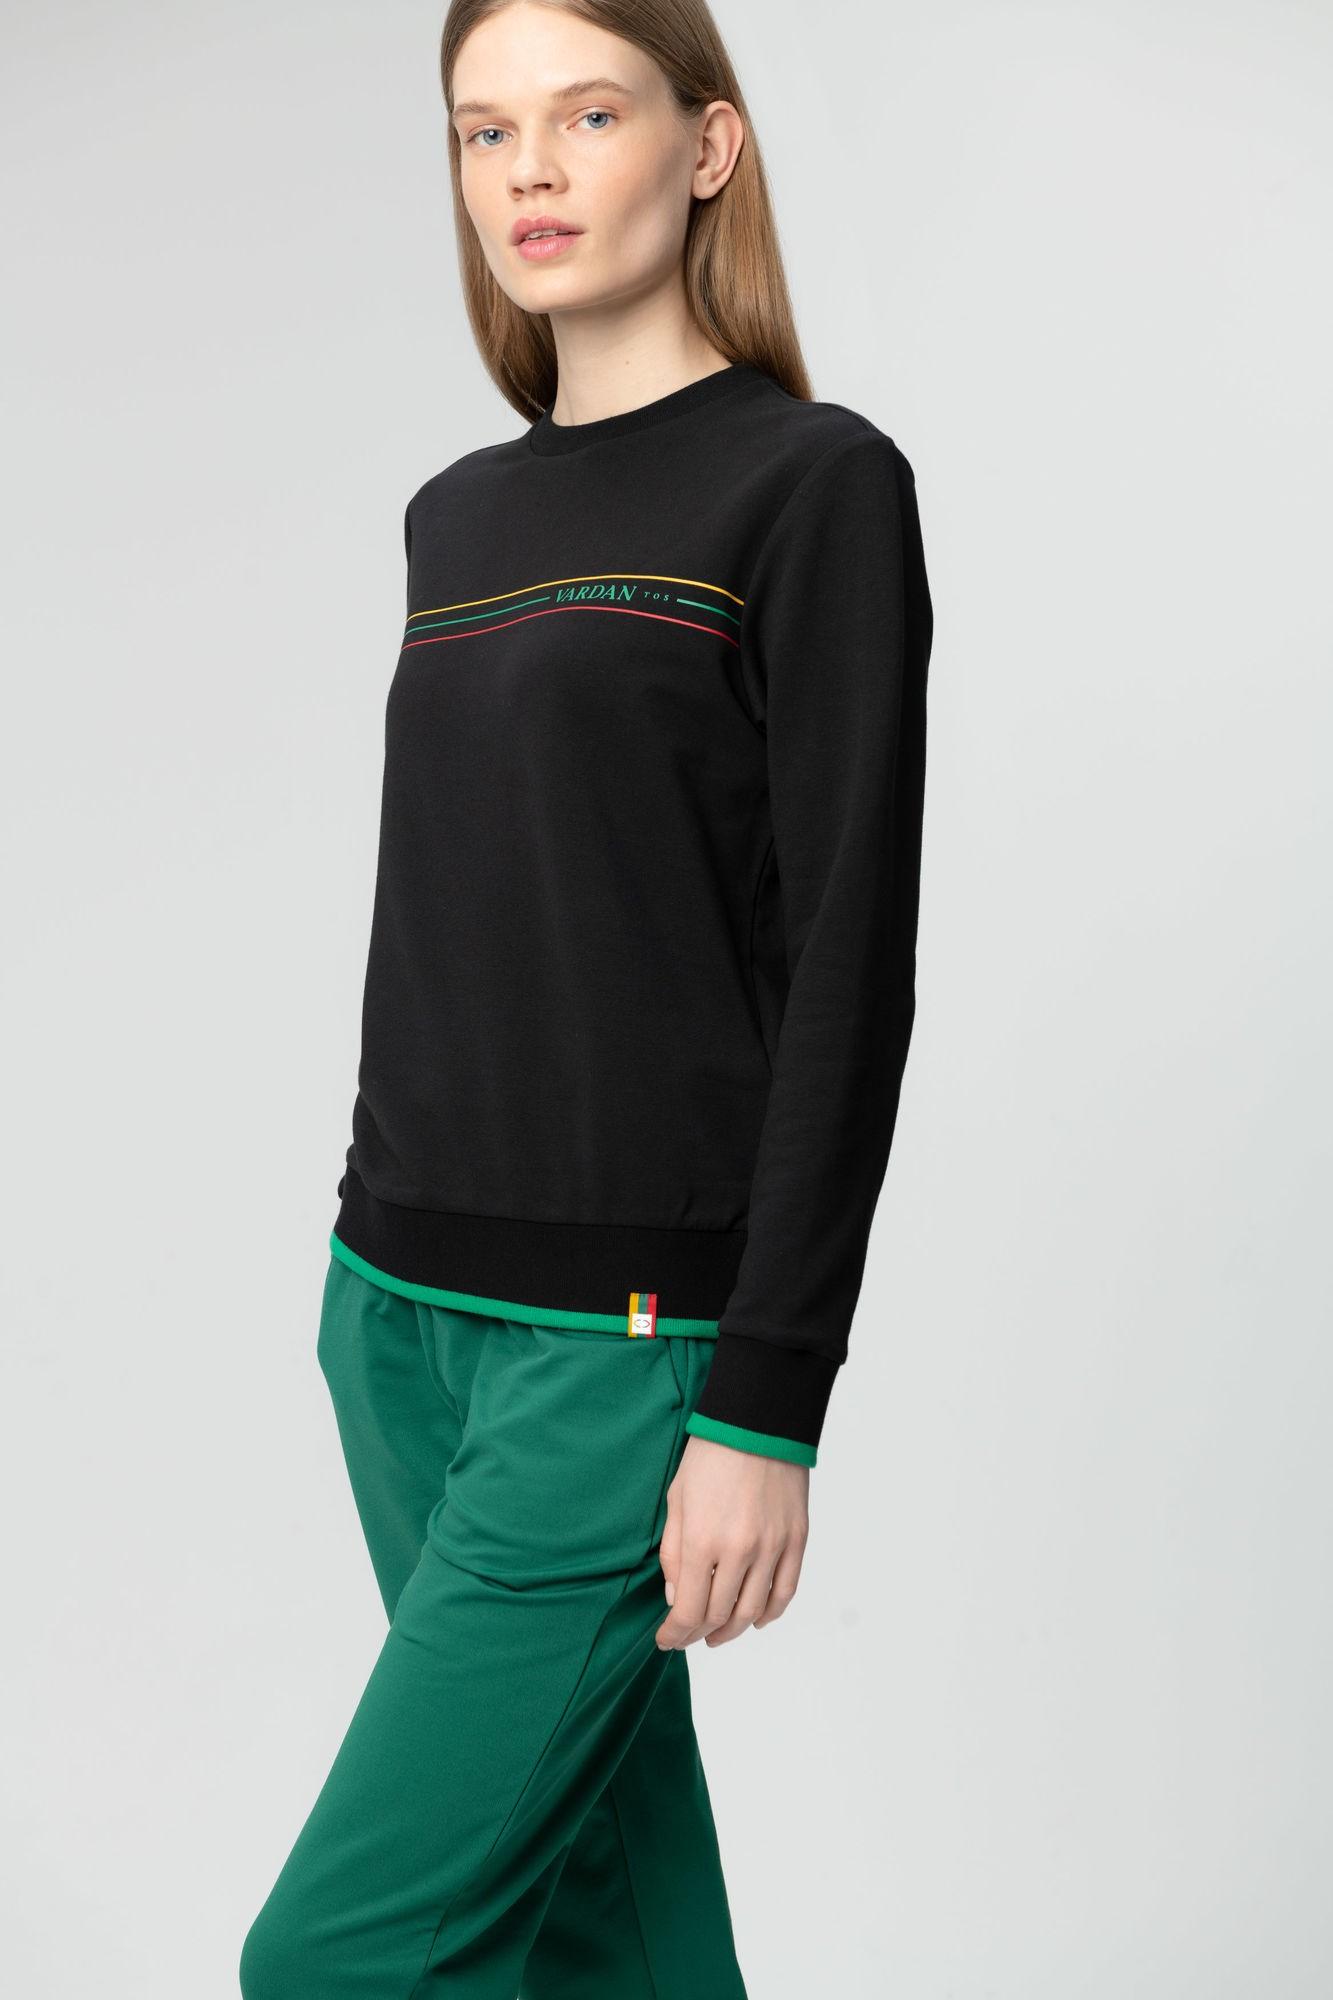 AUDIMAS Tamprus medvilninis džemperis 20LT-009 Black XS